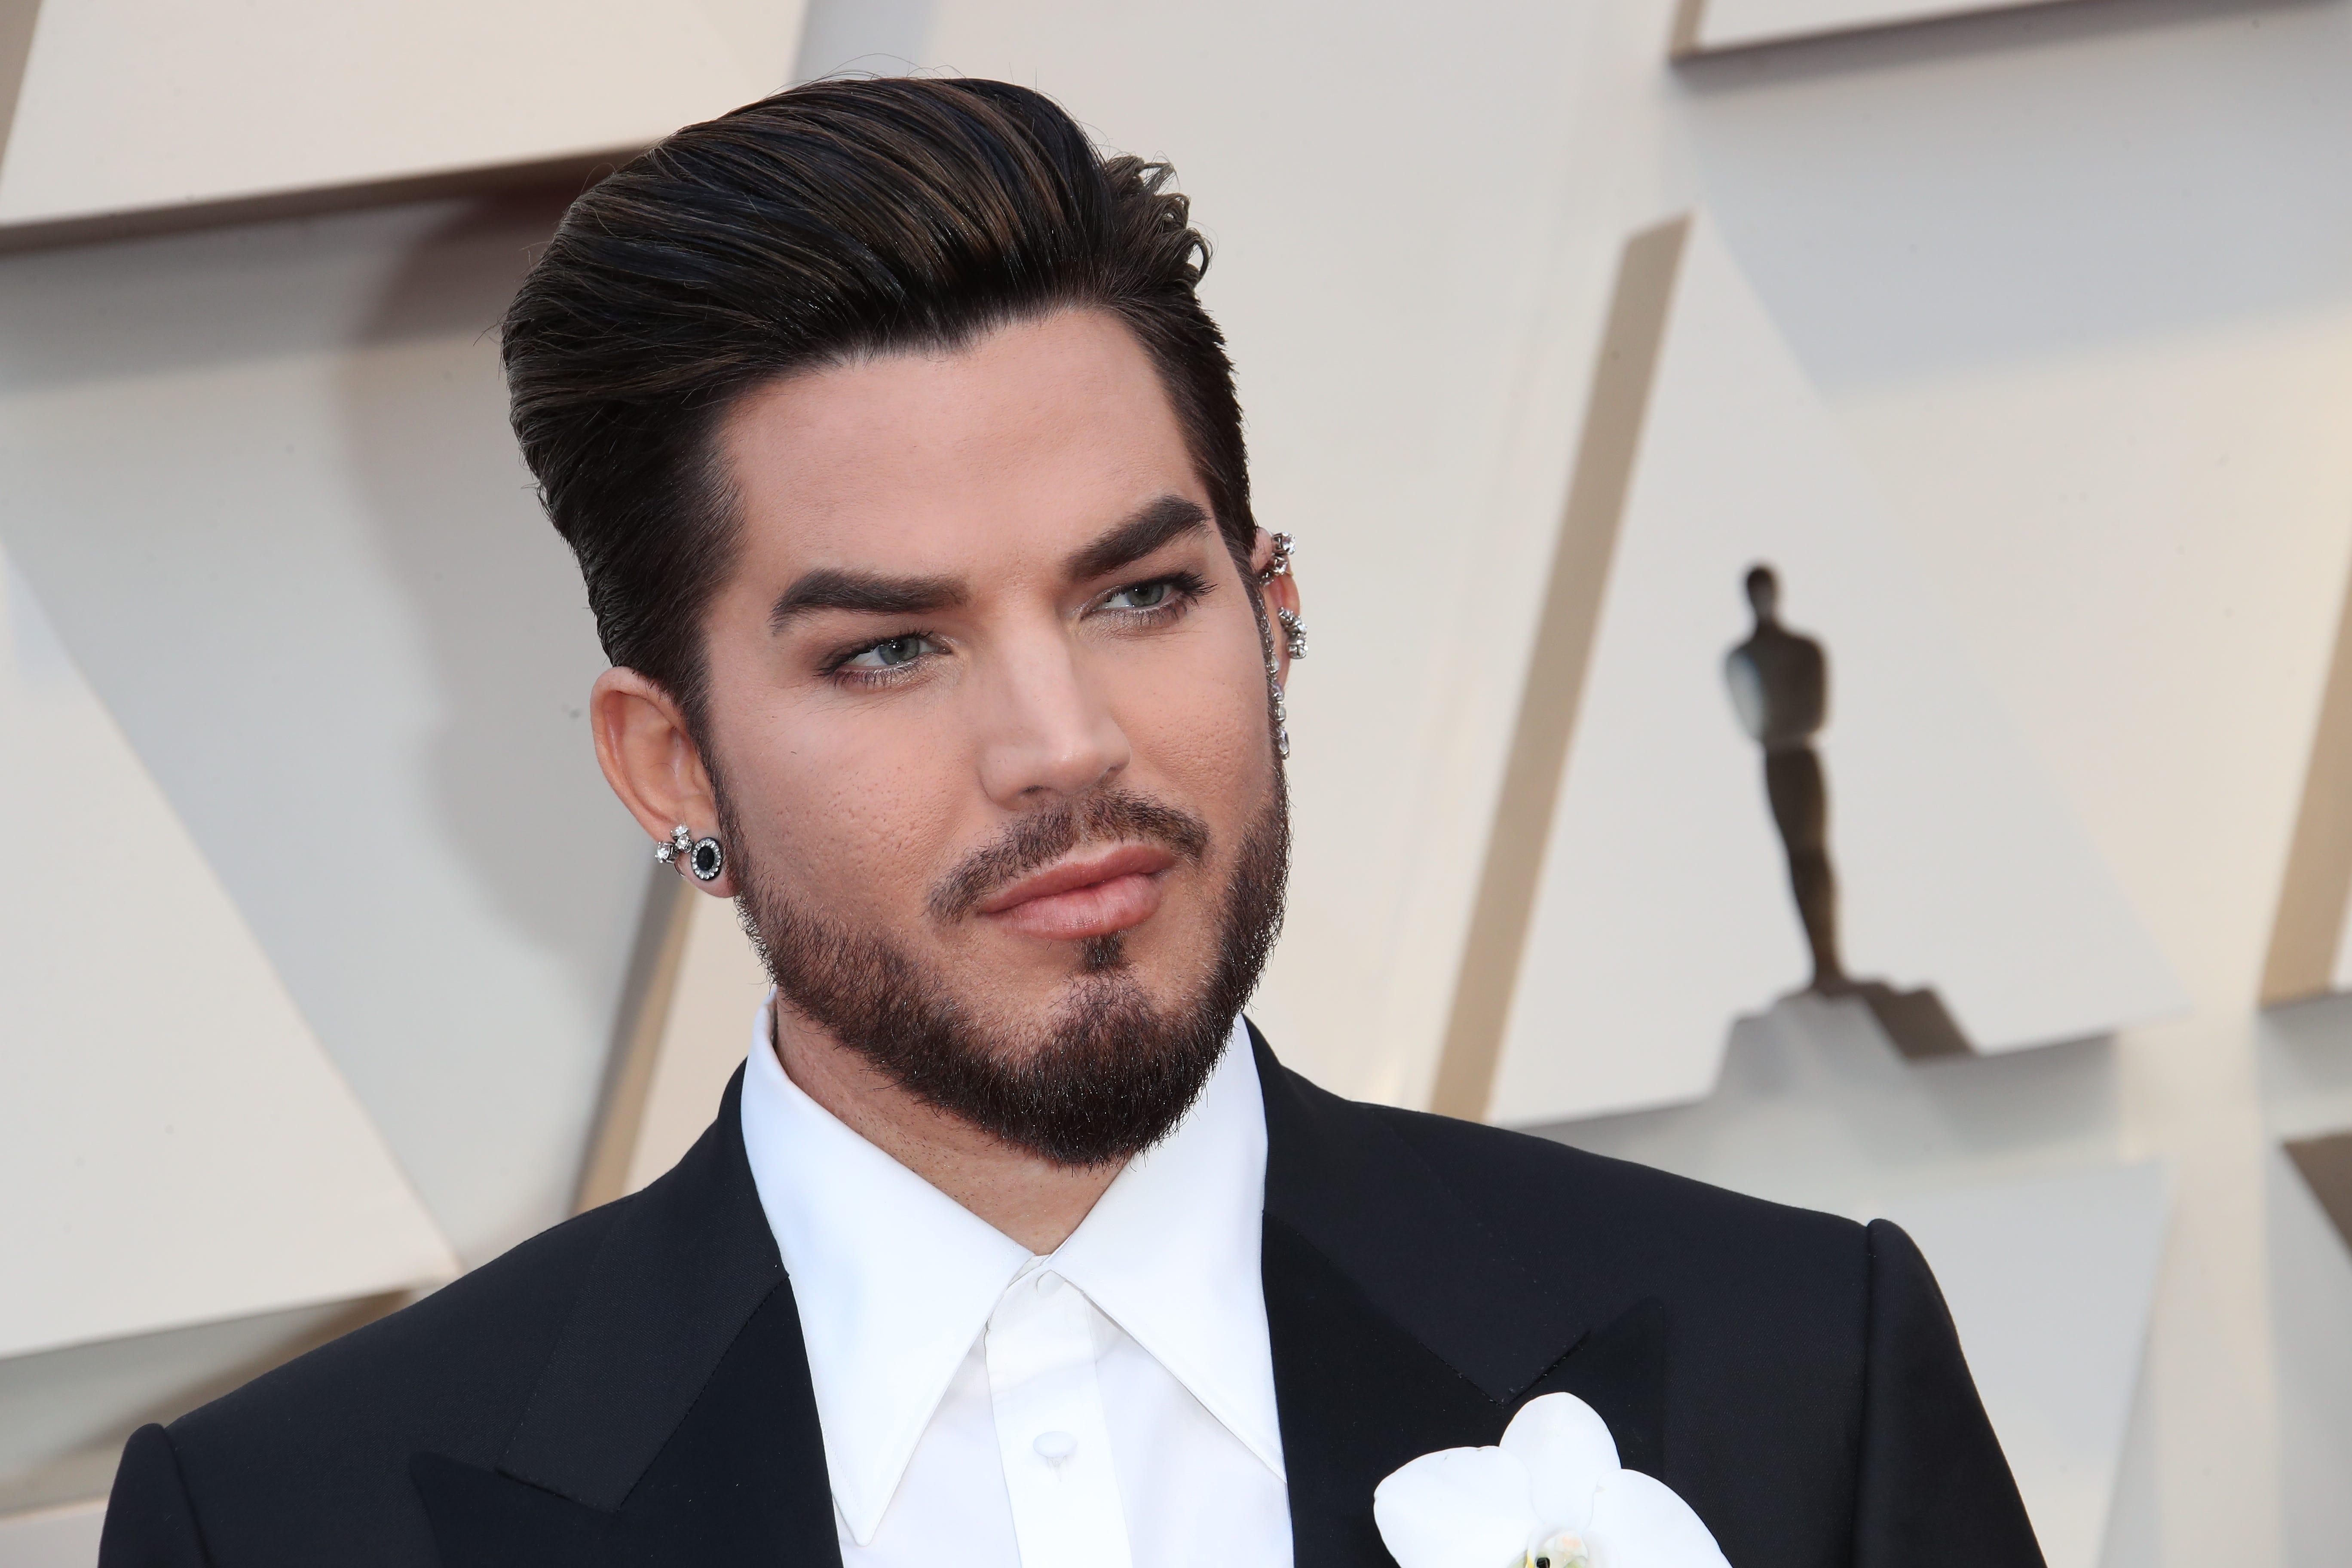 February 24, 2019; Los Angeles, CA, USA; Adam Lambert arrives at the 91st Academy Awards at the Dolby Theatre. Mandatory Credit: Dan MacMedan-USA TODAY NETWORK (Via OlyDrop)